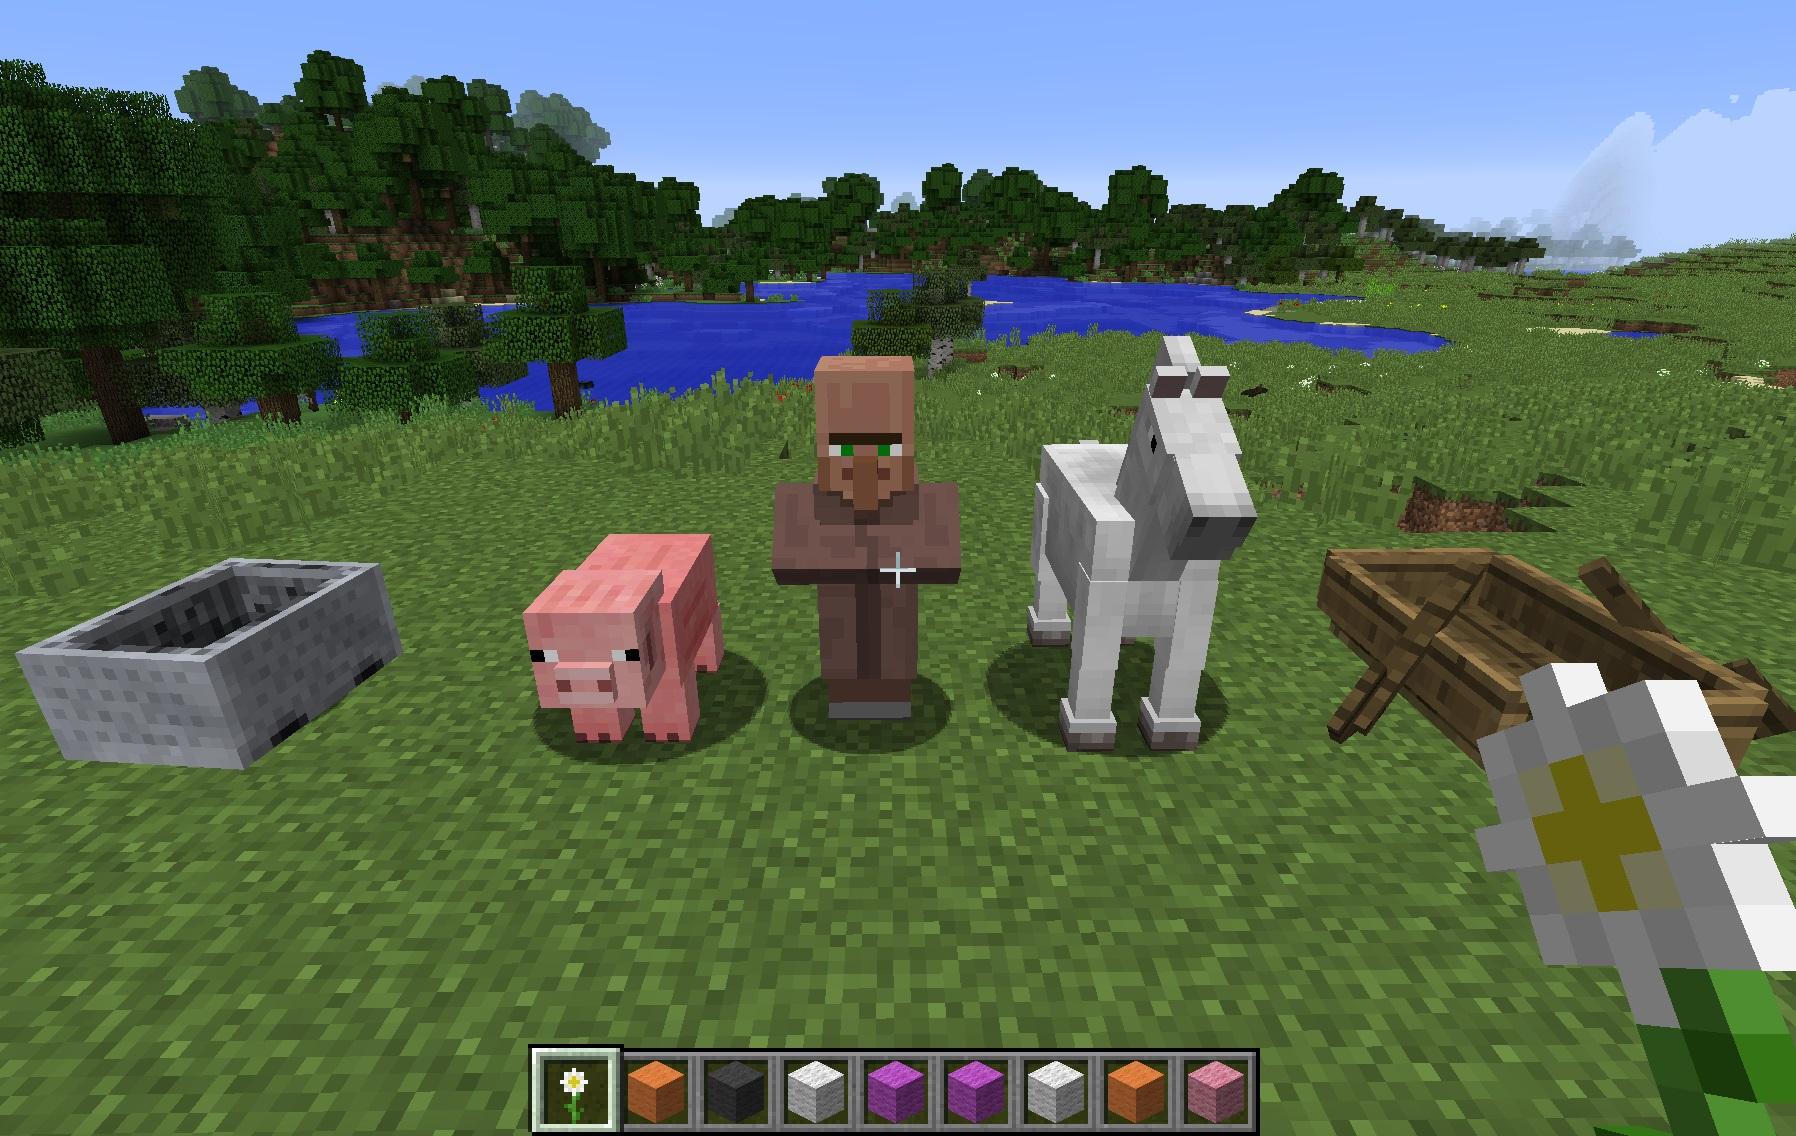 Wearable Backpacks Mod para Minecraft 1.11.2